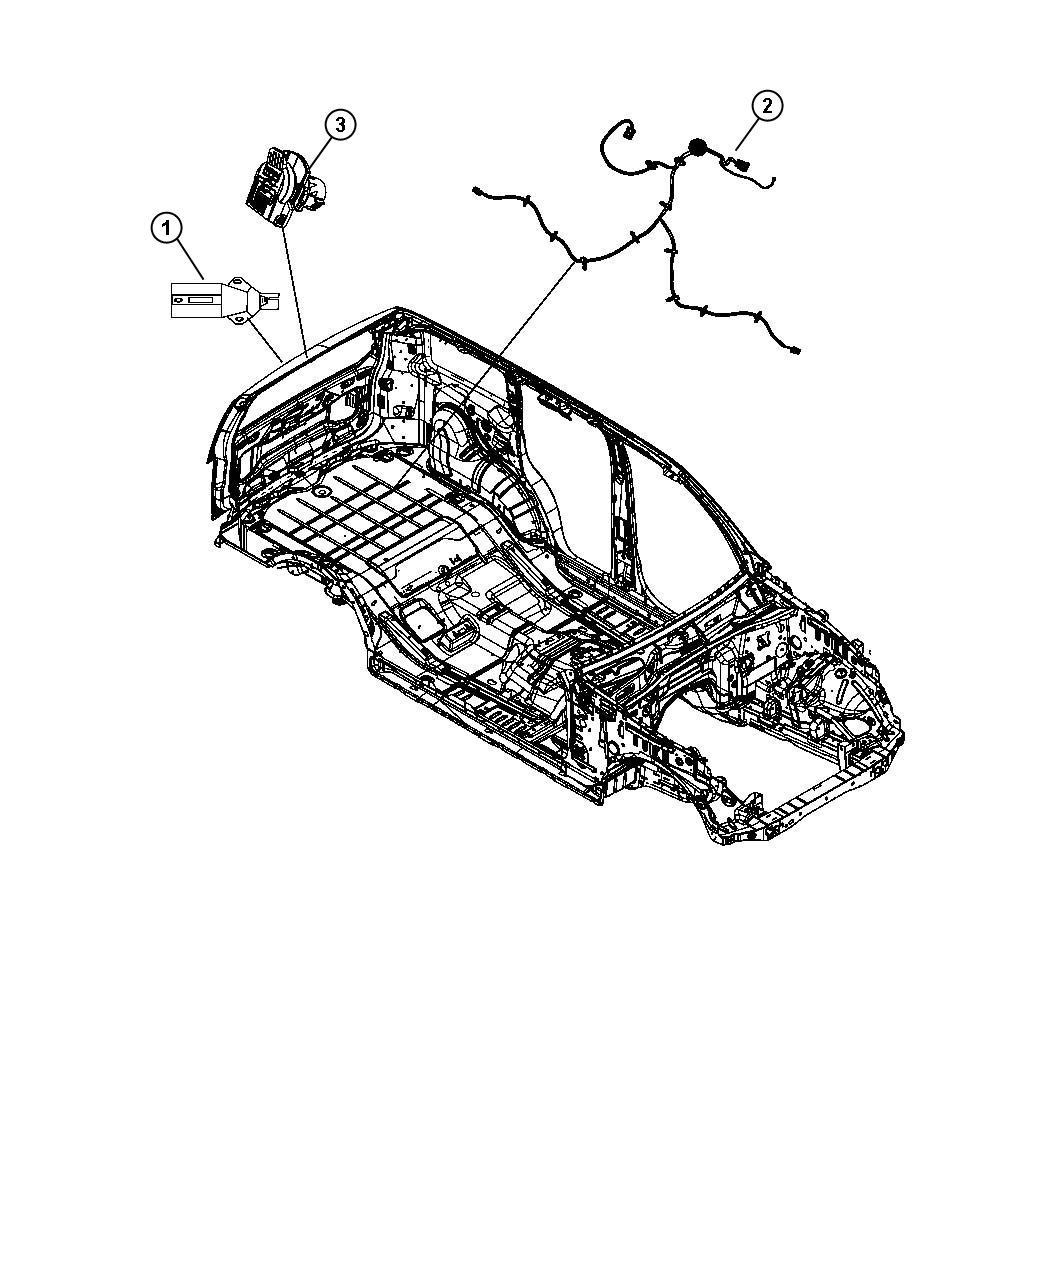 2008 Dodge Nitro Wiring  Fuel Tank   18 5 Gallon Fuel Tank